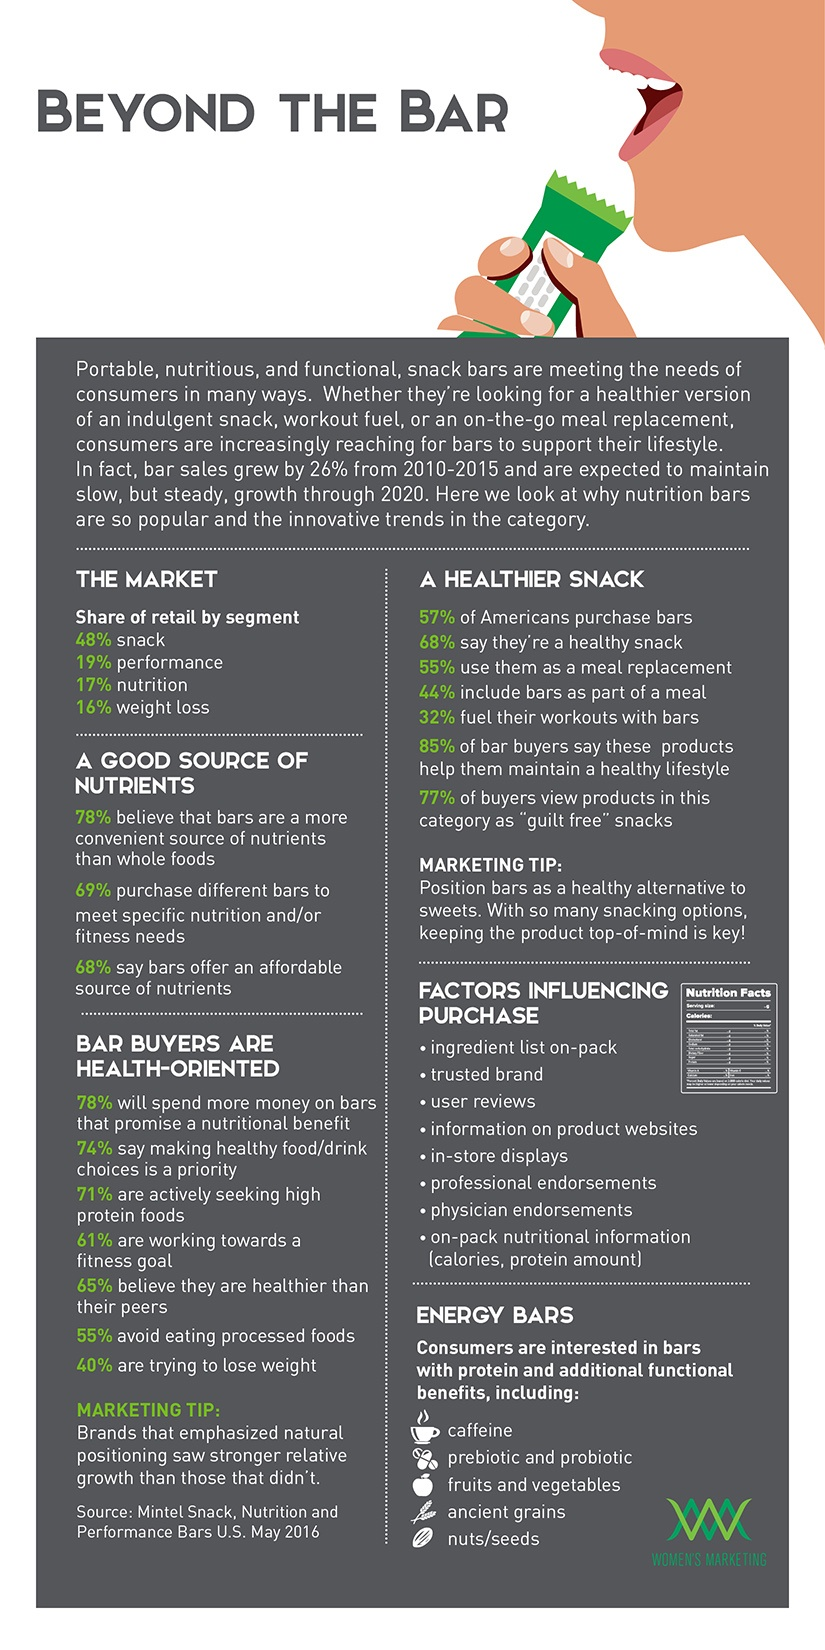 BeyondtheBar_infographic_FINAL.jpg